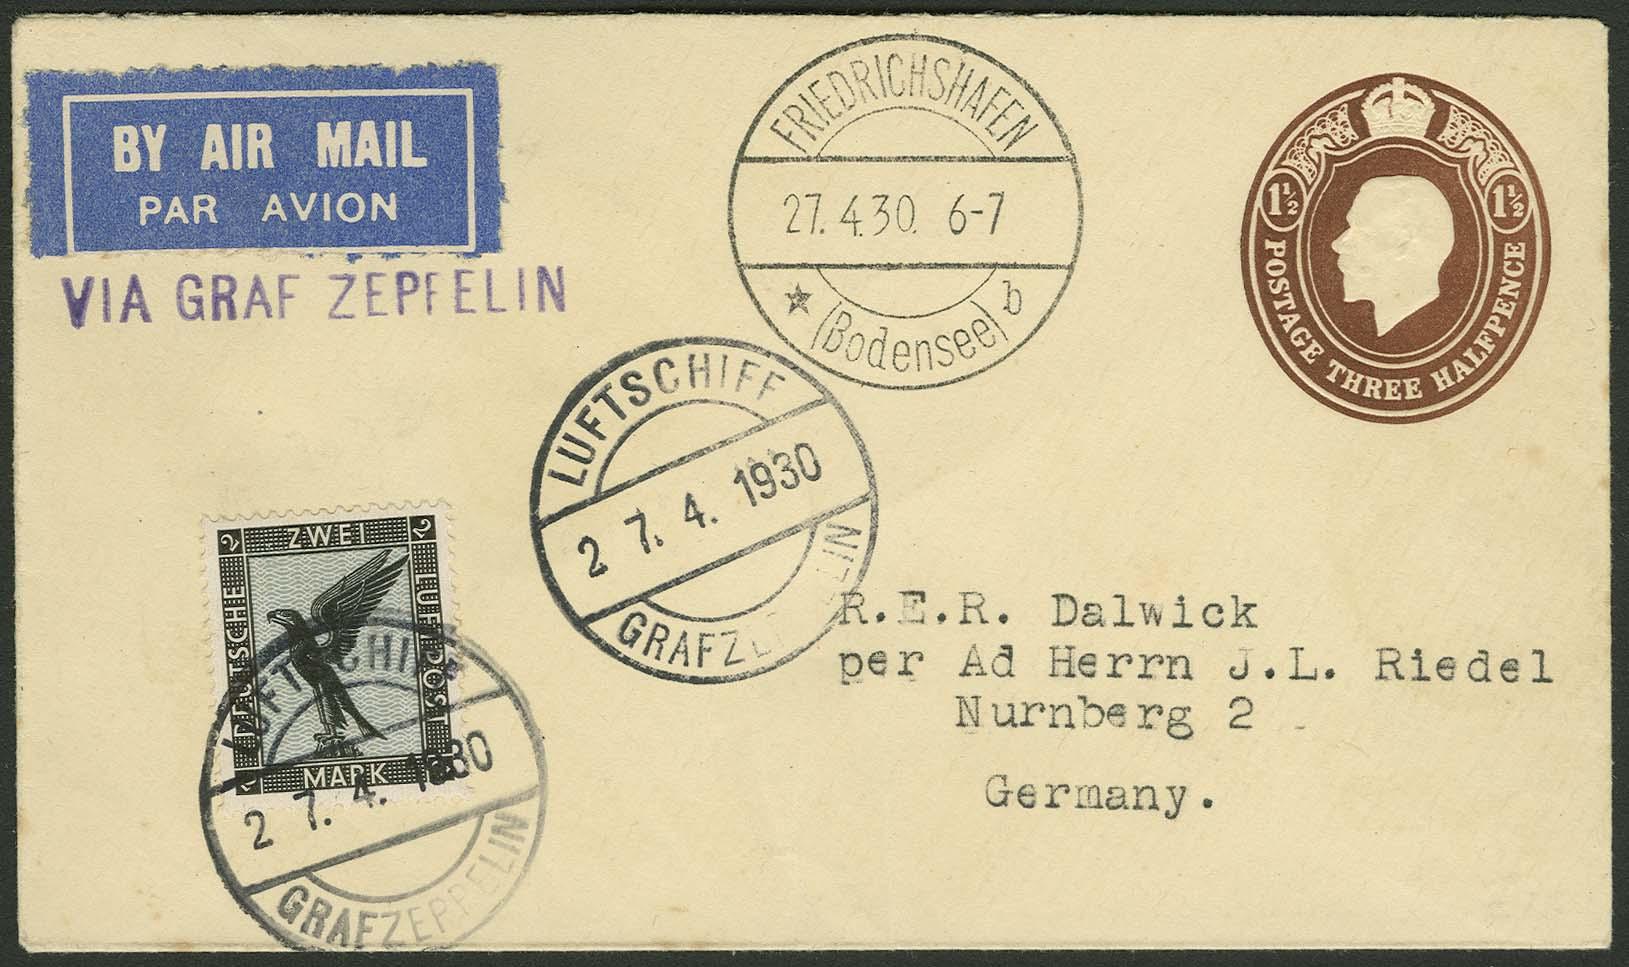 Lot 4207 - zeppelinpost nach sieger LZ 127 - 1930 -  Auktionshaus Ulrich Felzmann GmbH & Co. KG